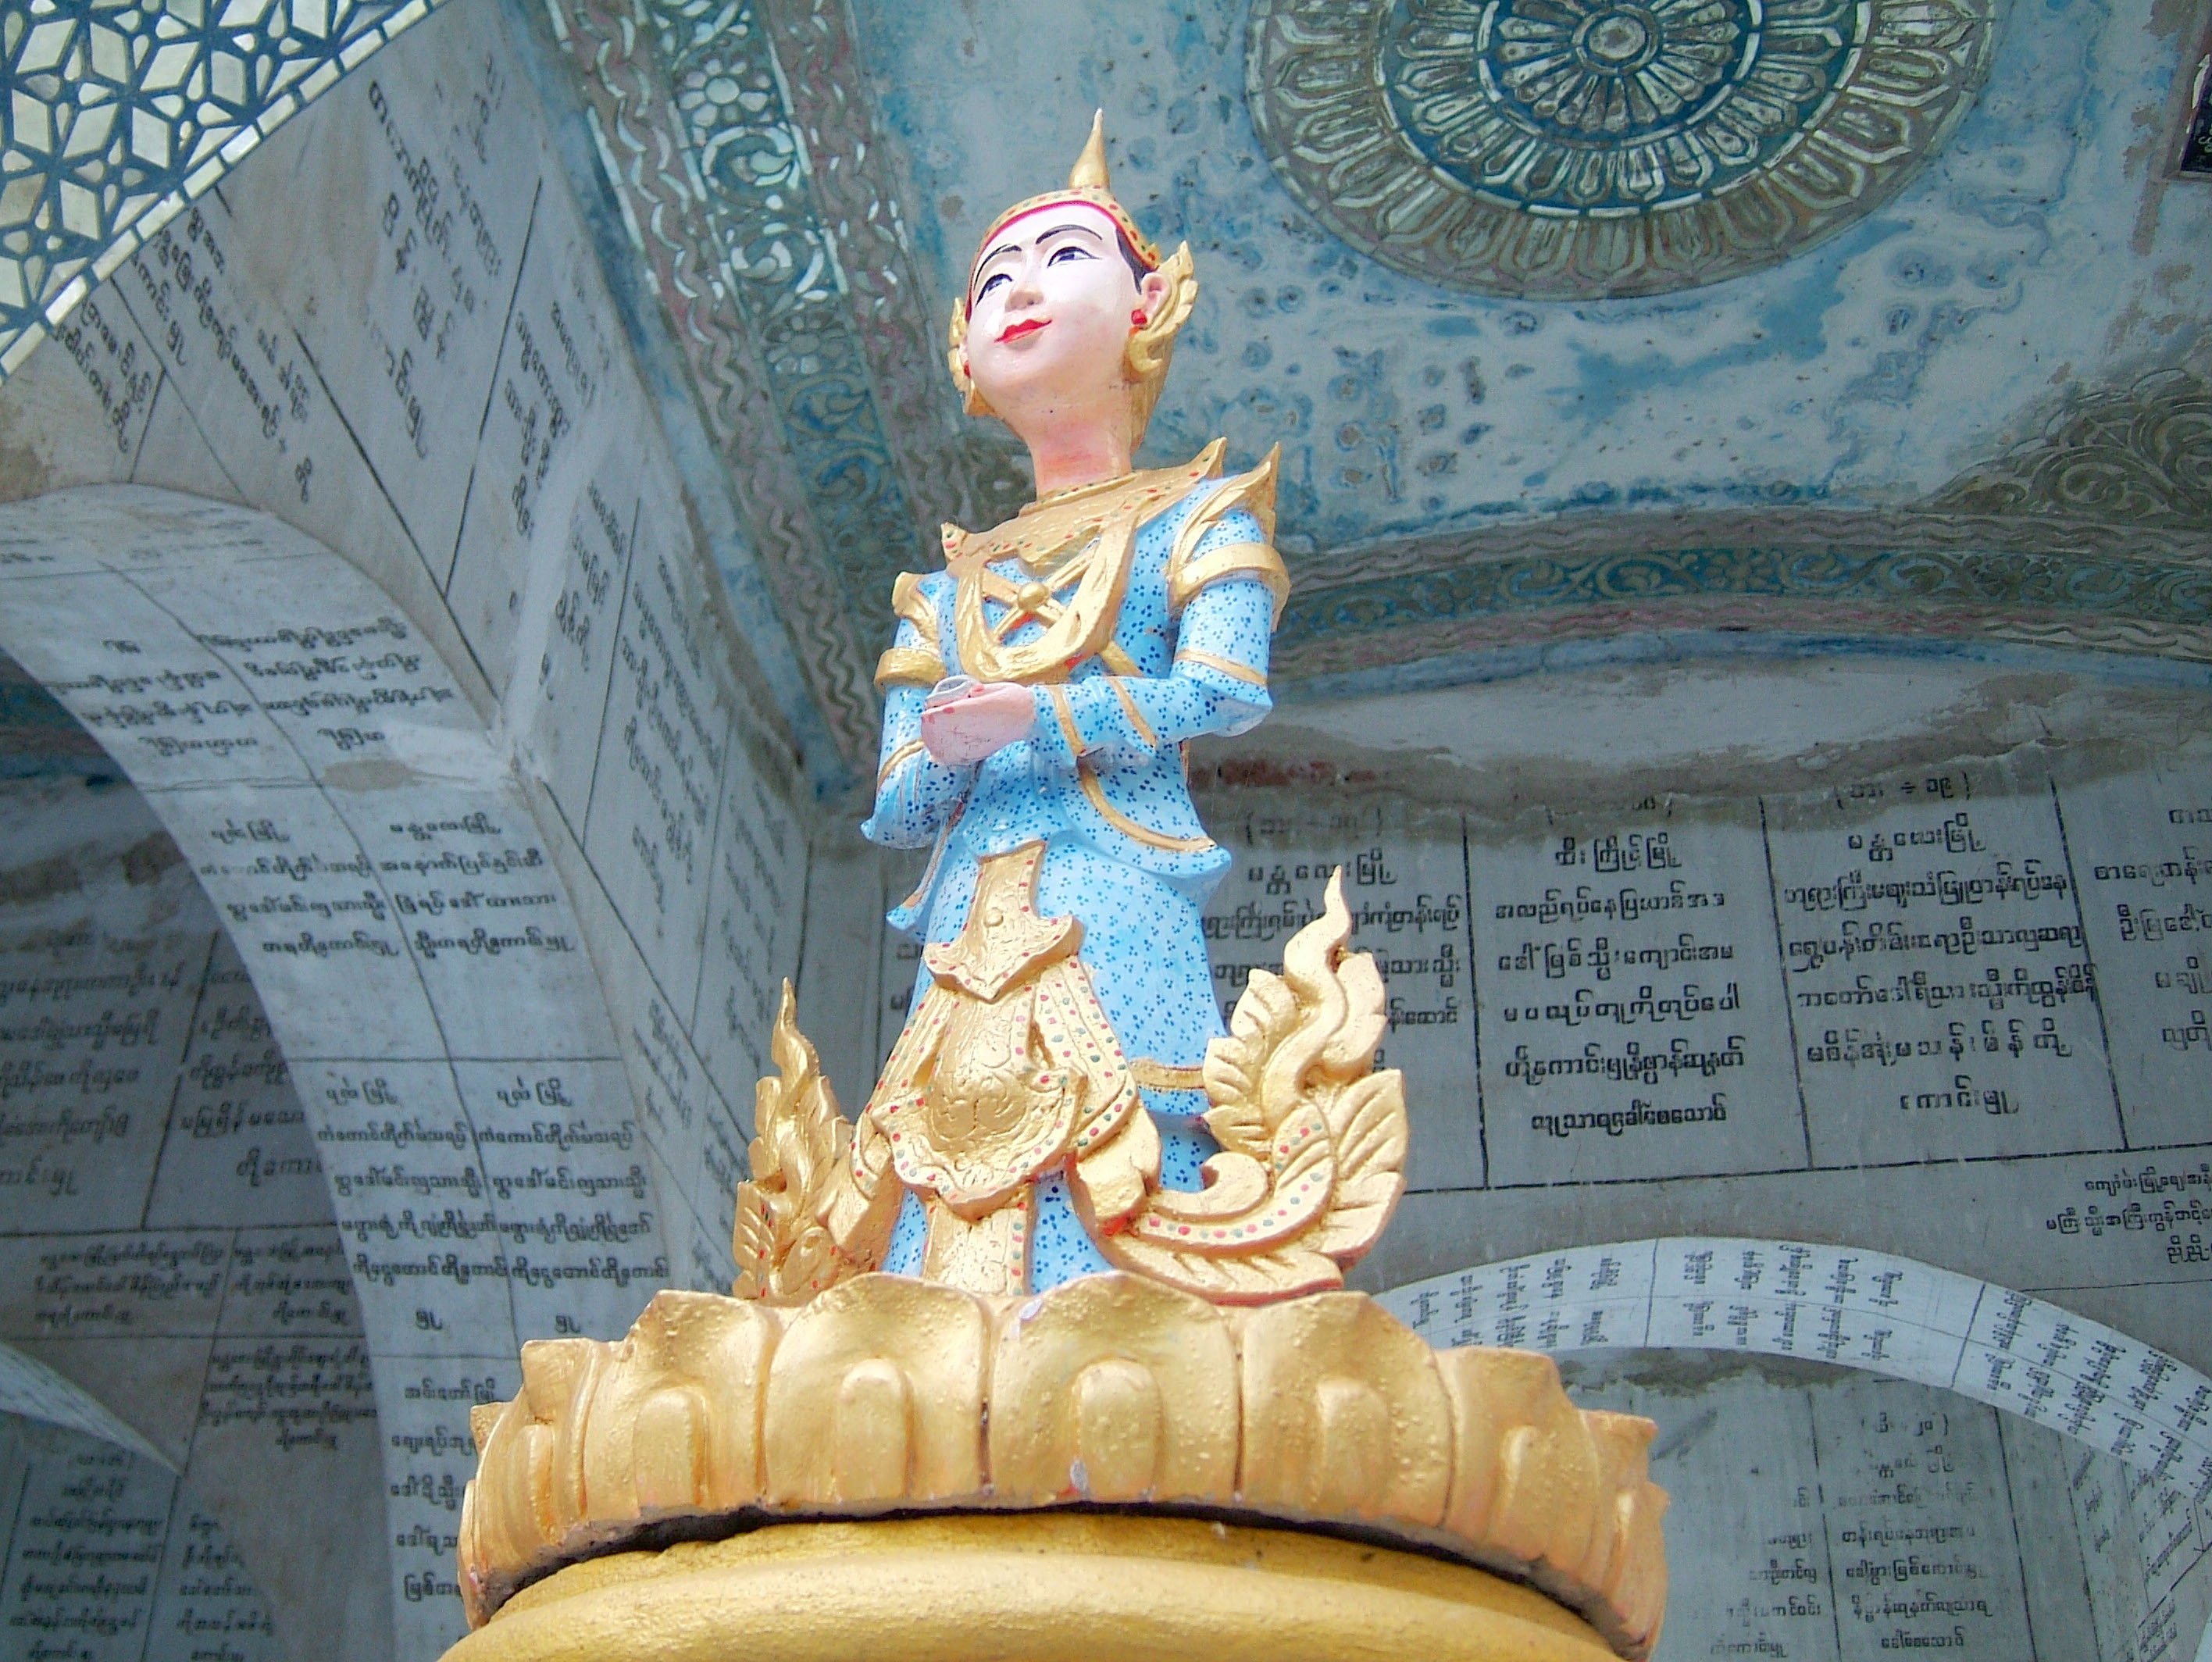 Mandalay Hill Sutaungpyei Pagoda nats Dec 2000 01